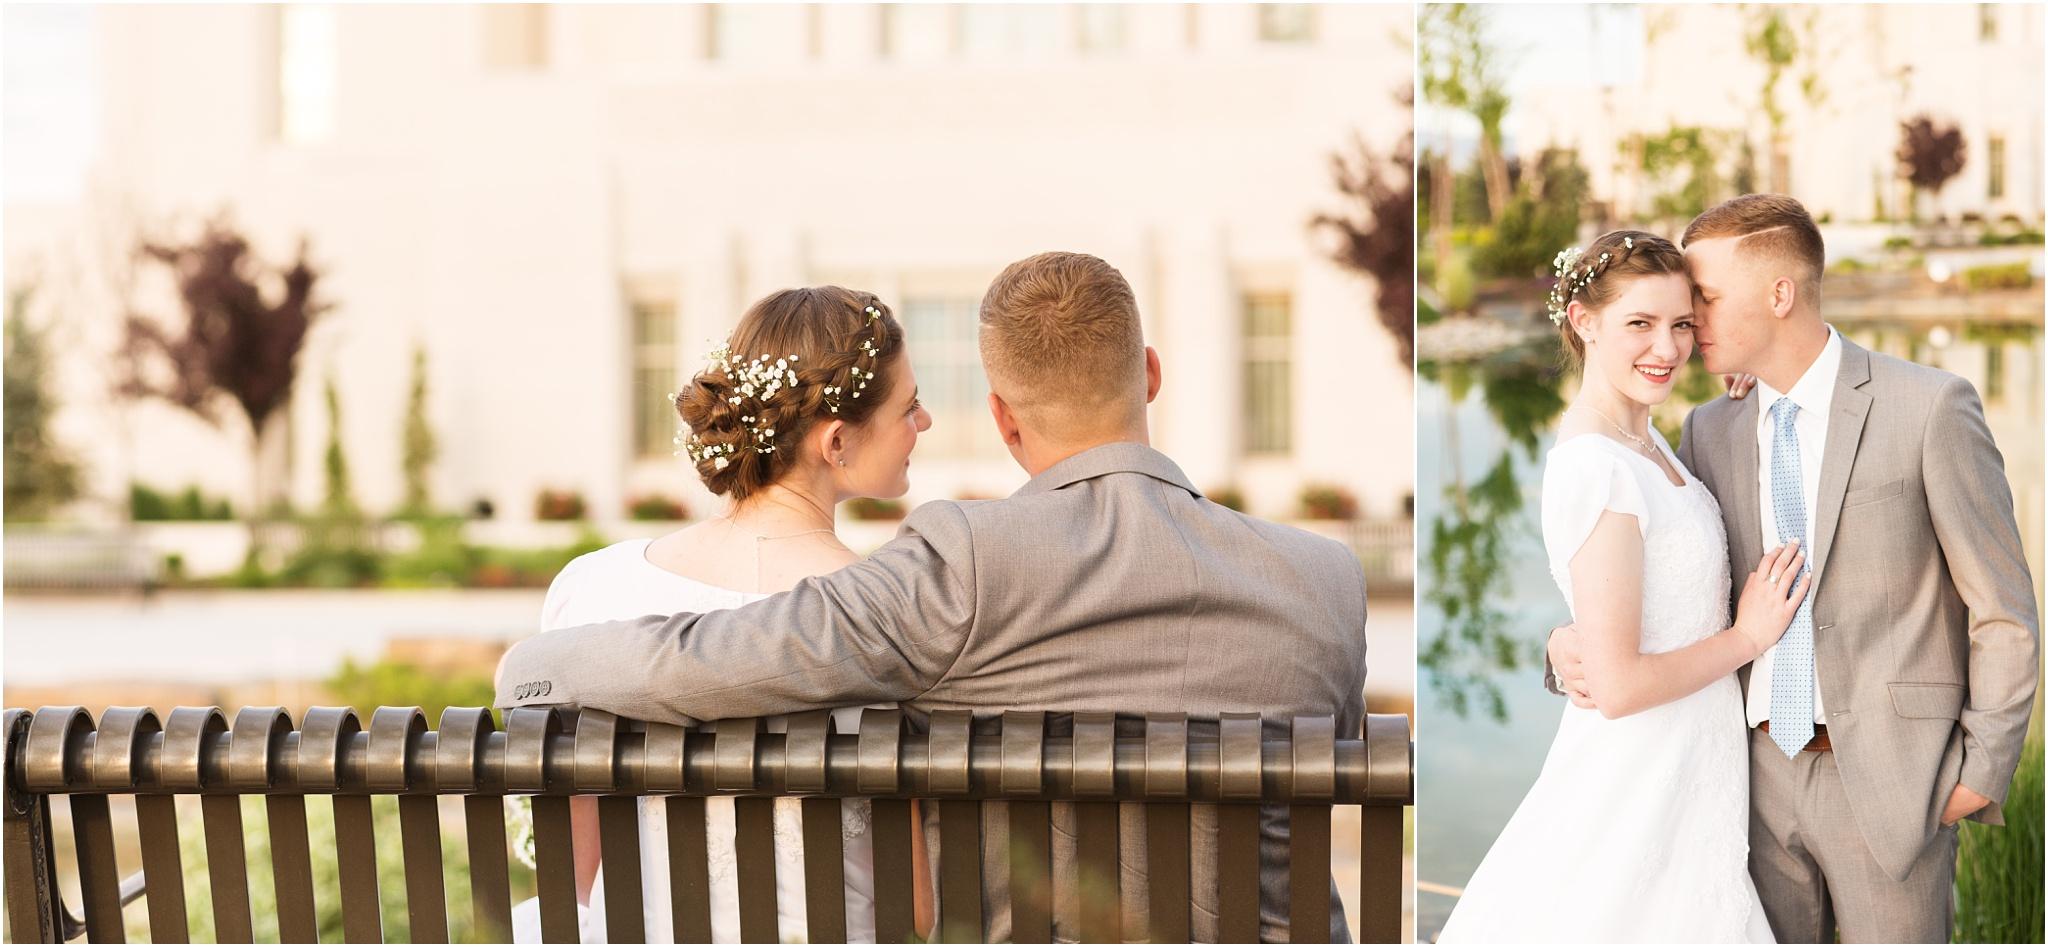 Wedding Photography_Meridian Idaho Temple_Boise Idaho_Leah Southwick Photography_0029.jpg